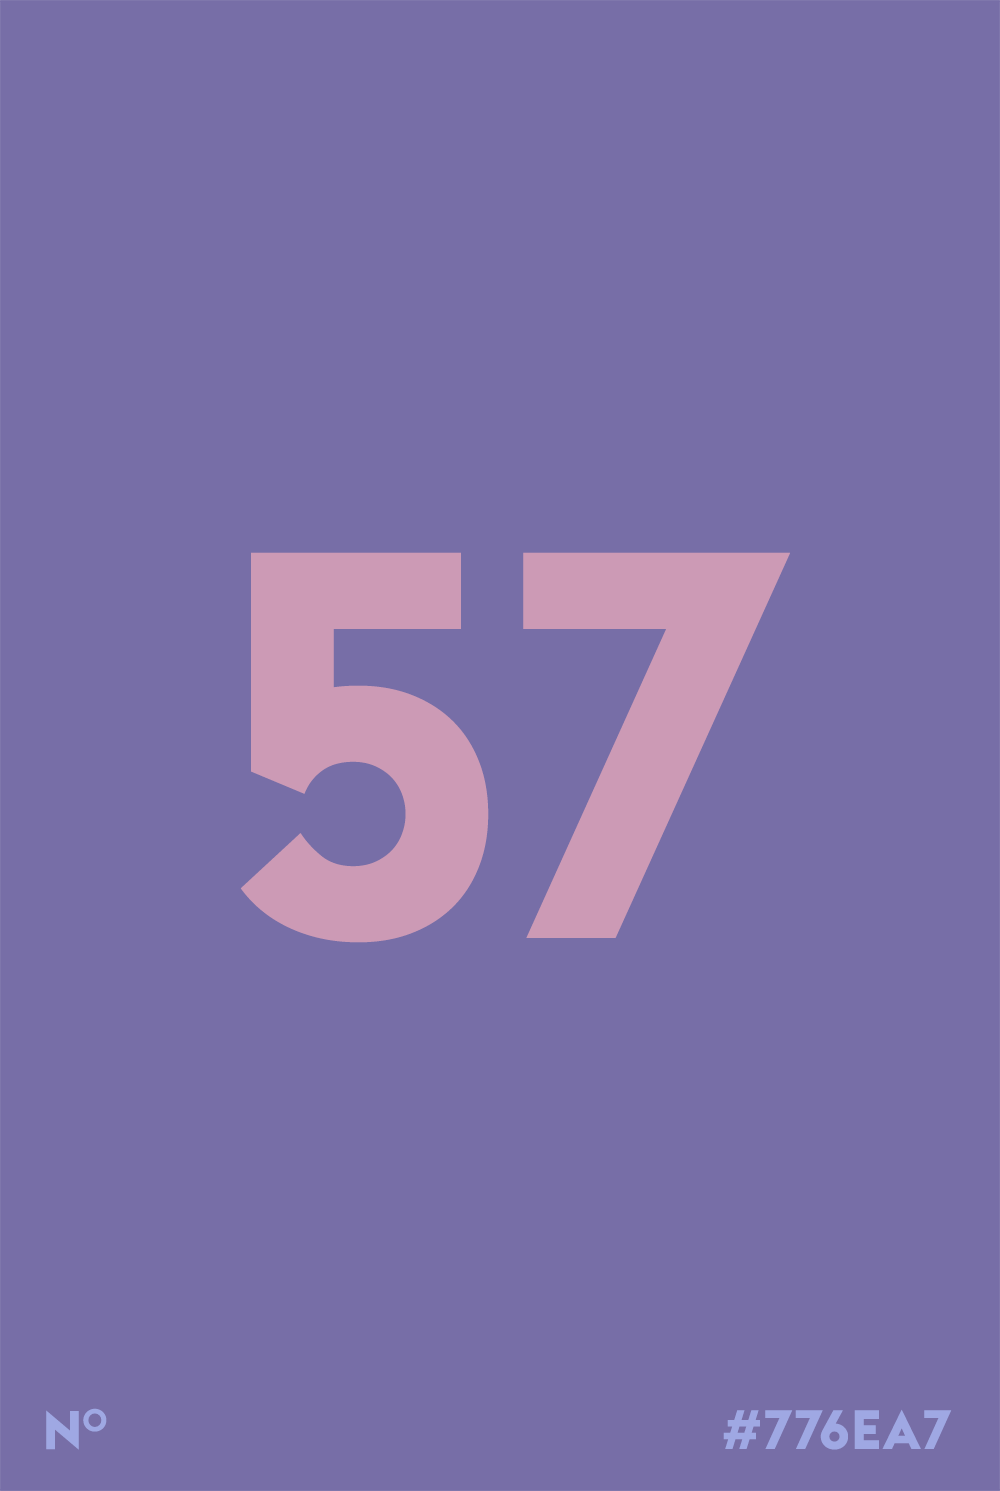 cc_0056_57